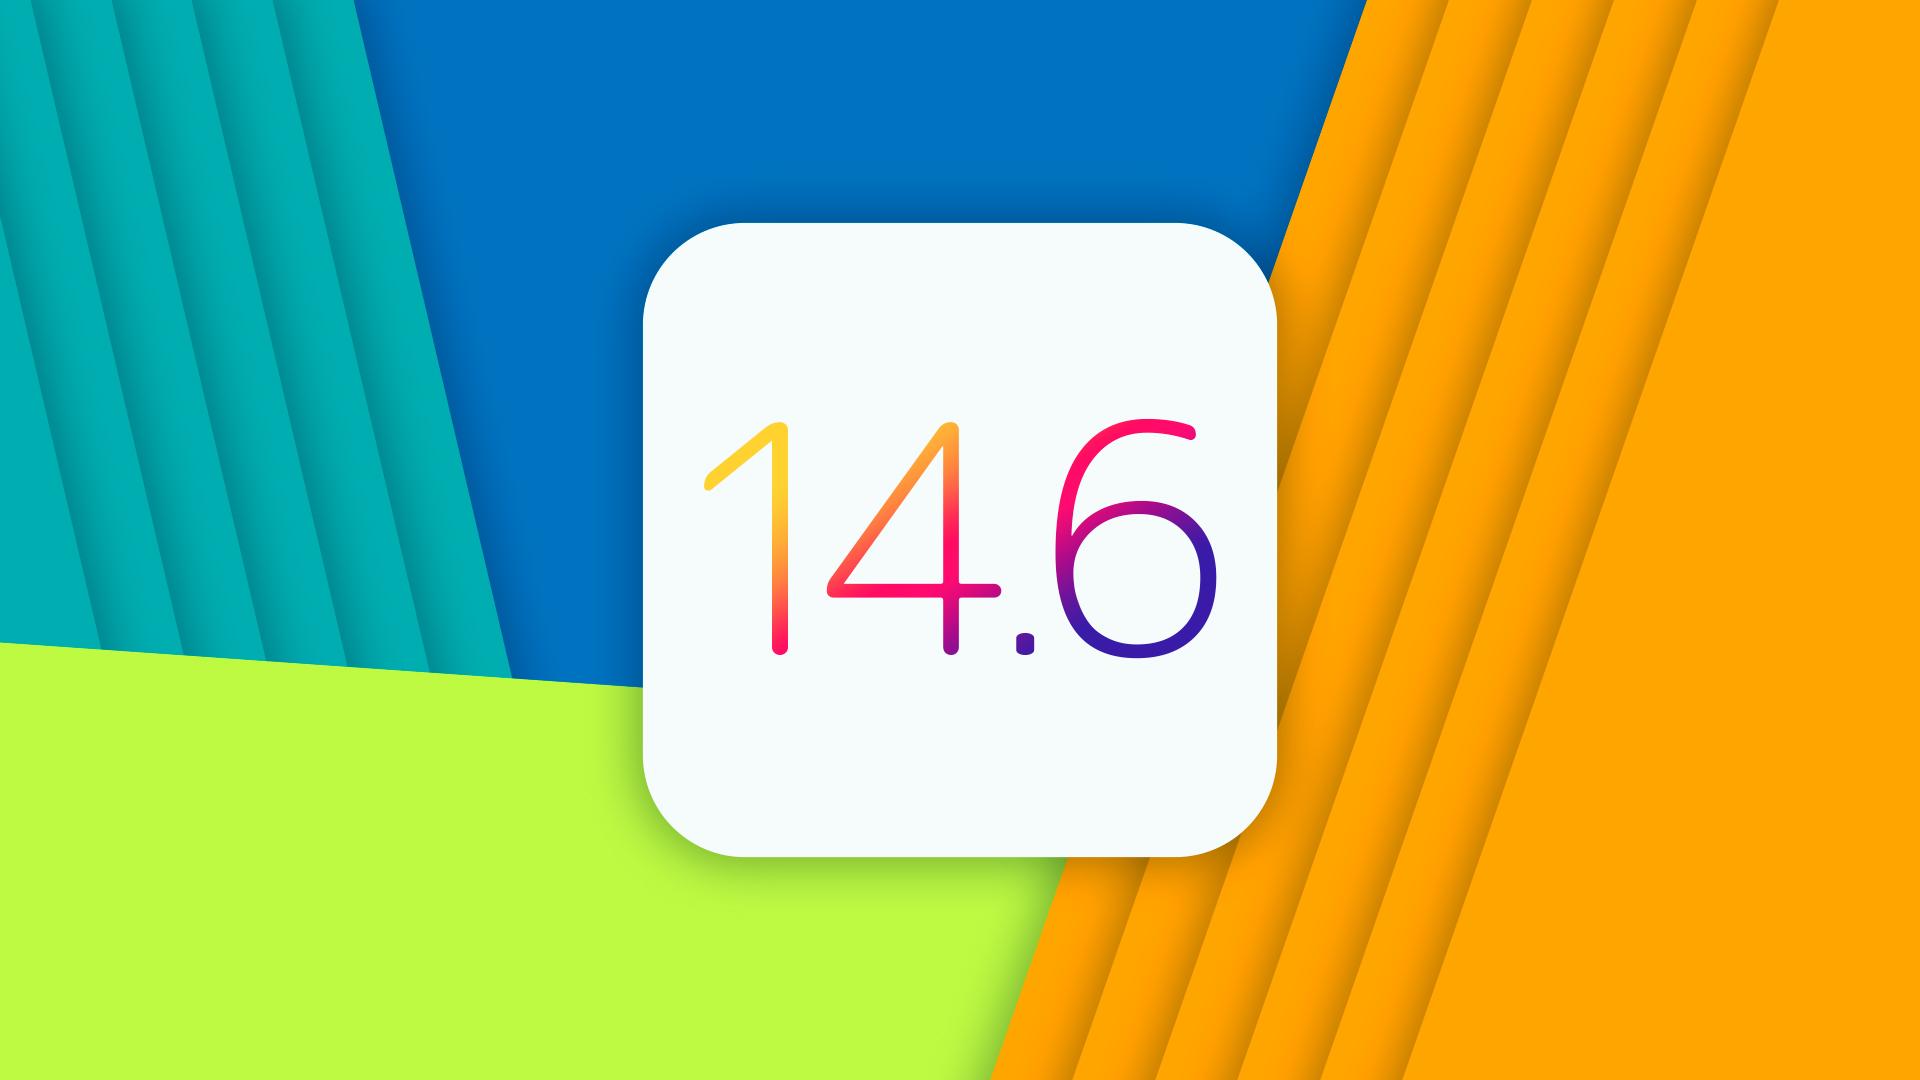 Betriebssystem, Apple, iOS, iPadOS, Apple iOS, Apple iPadOS, iOS Update, 14, 14.6, iPadOS 14.6, iOS 14.6